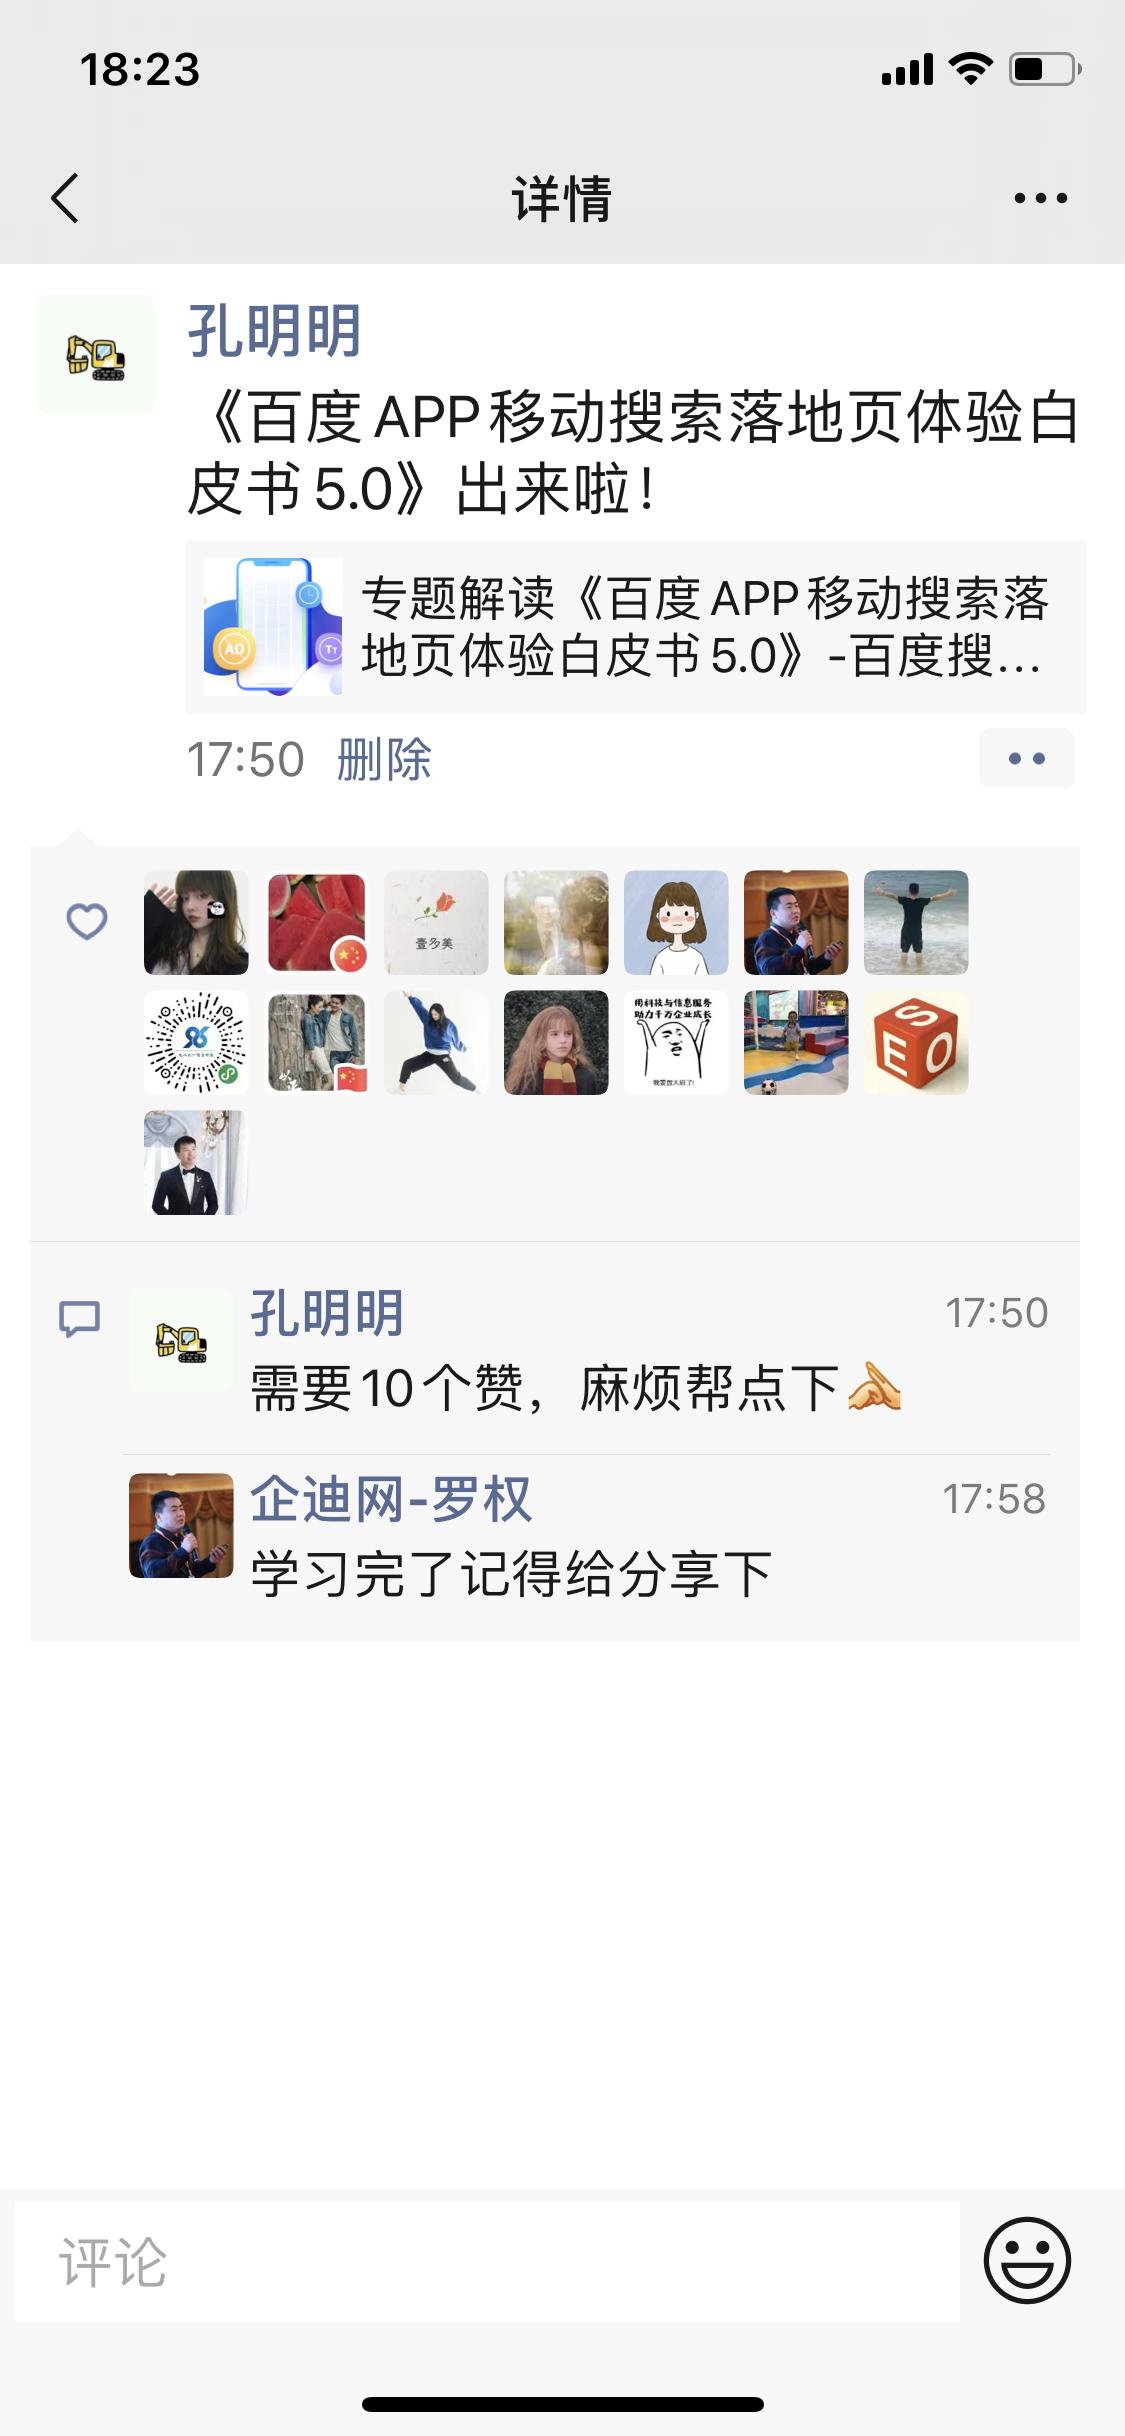 QQ图片20200417182407.png